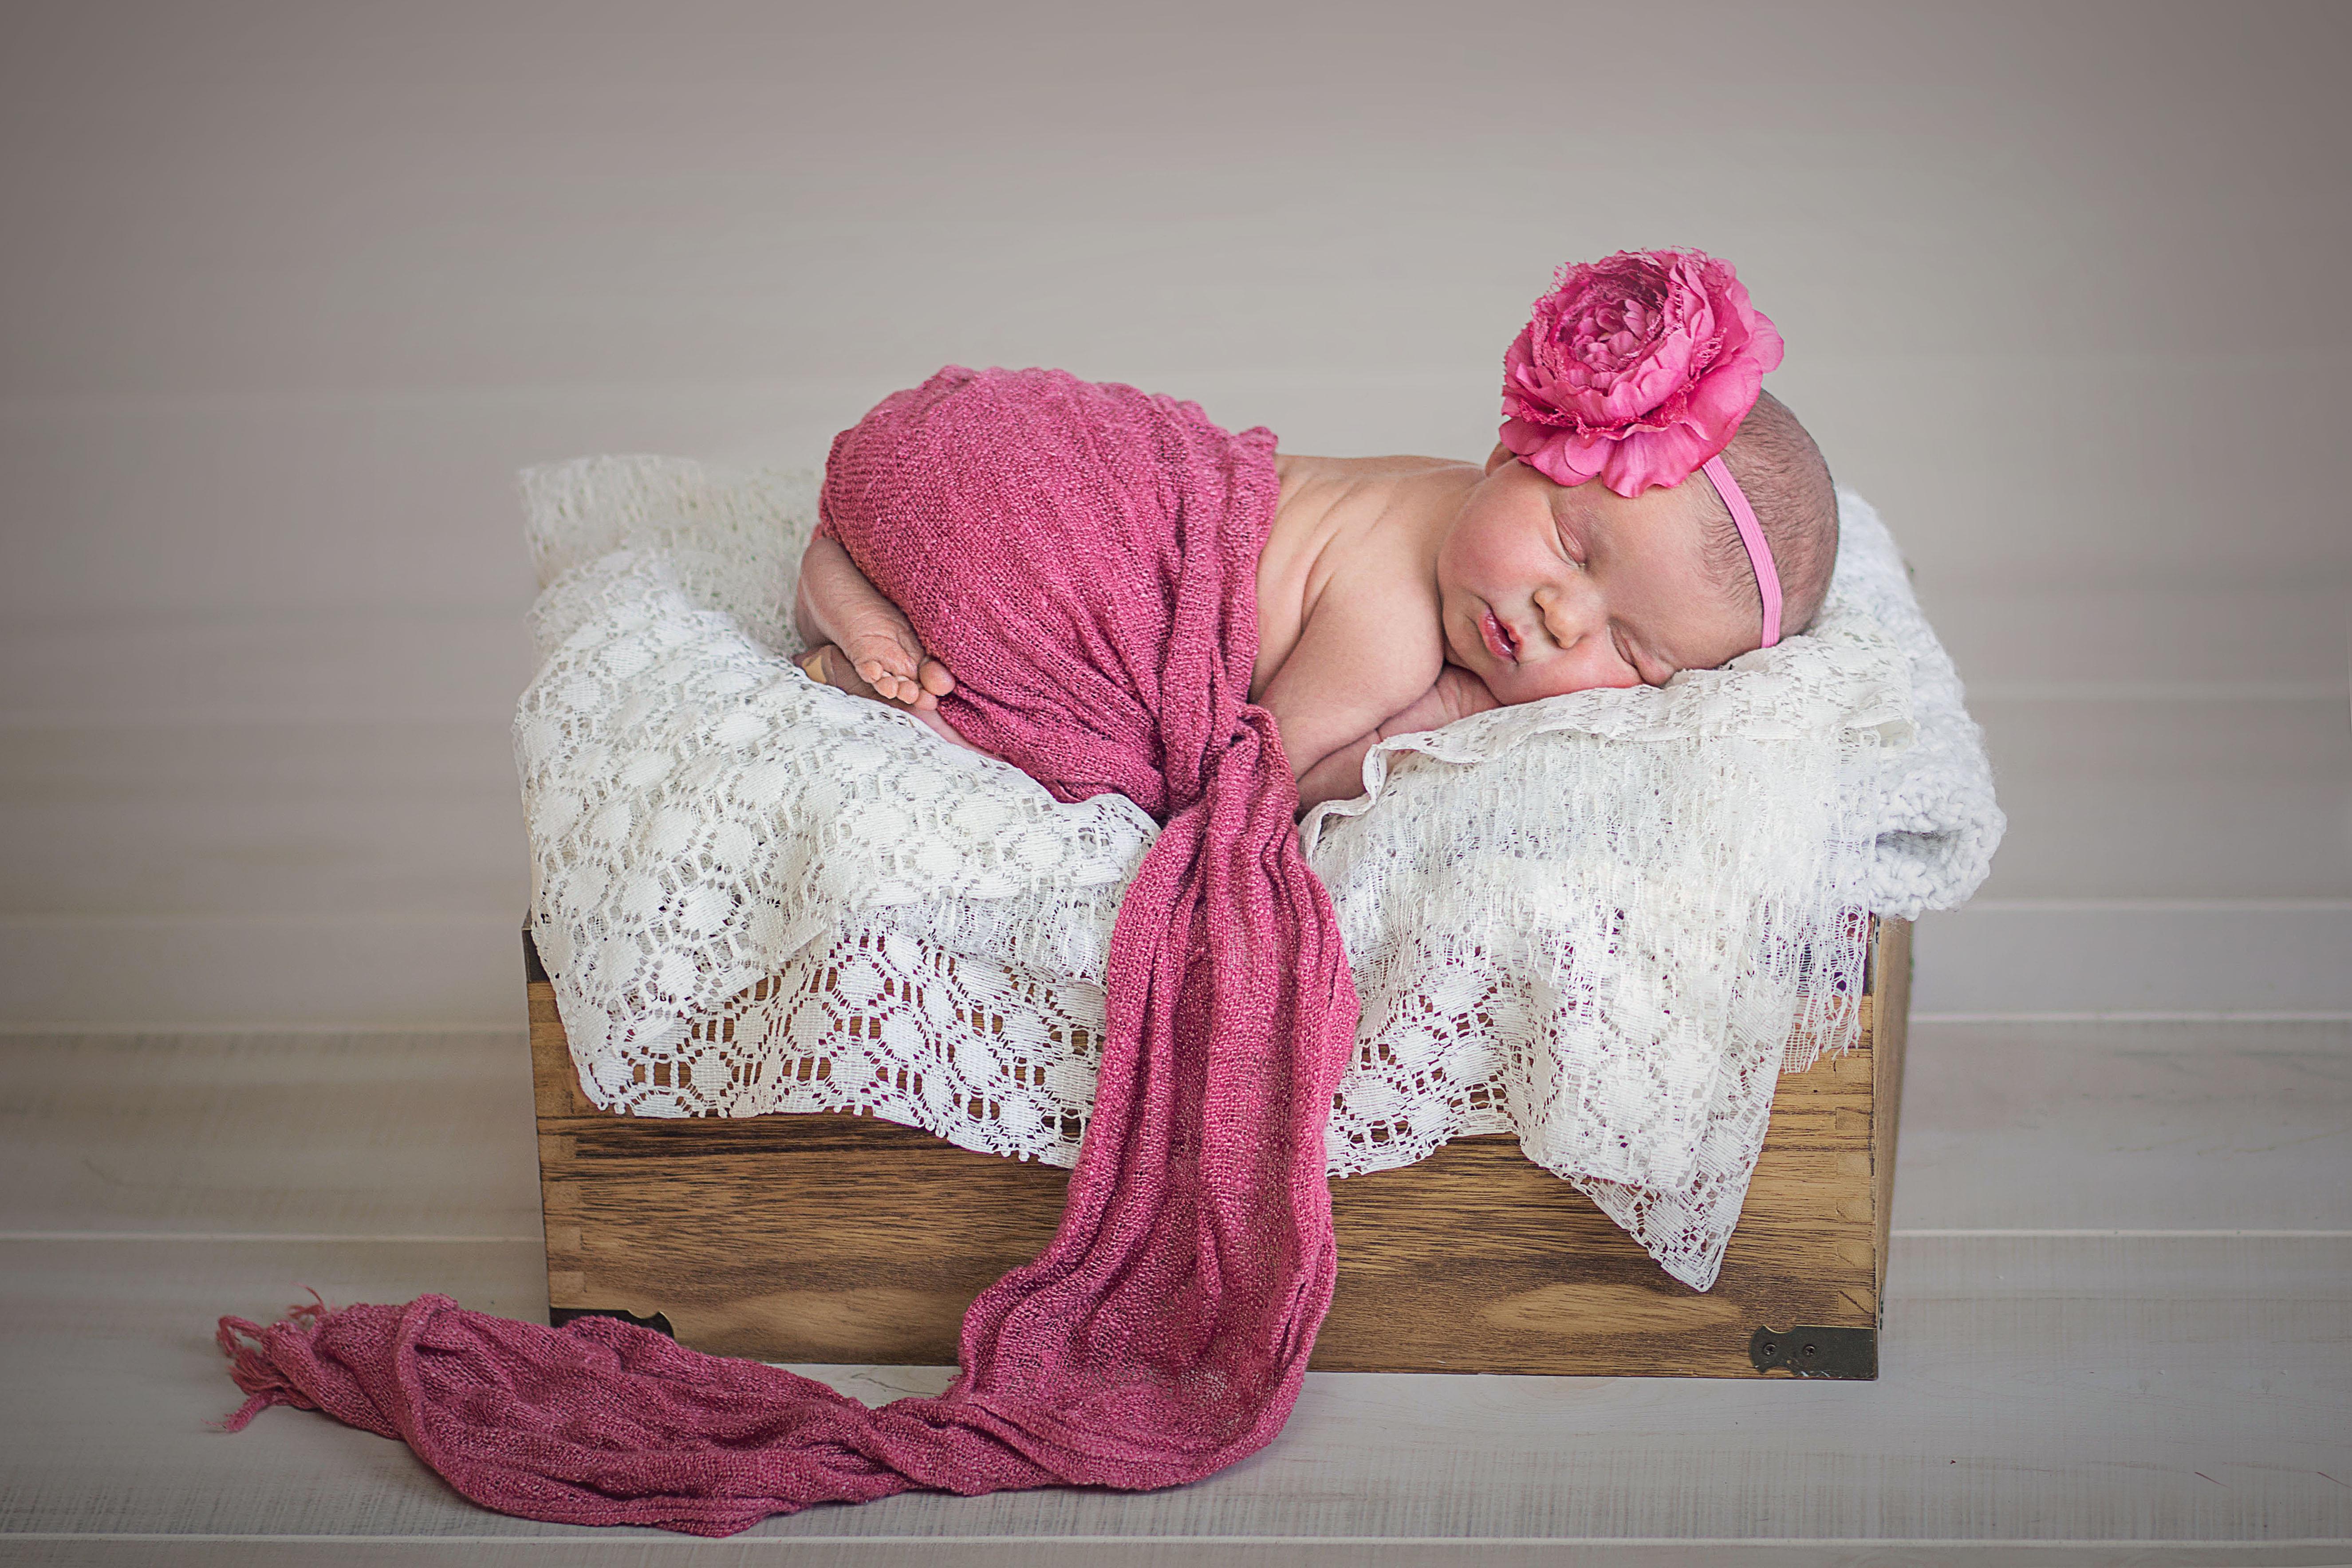 Elyse Carpenter Newborn Photography